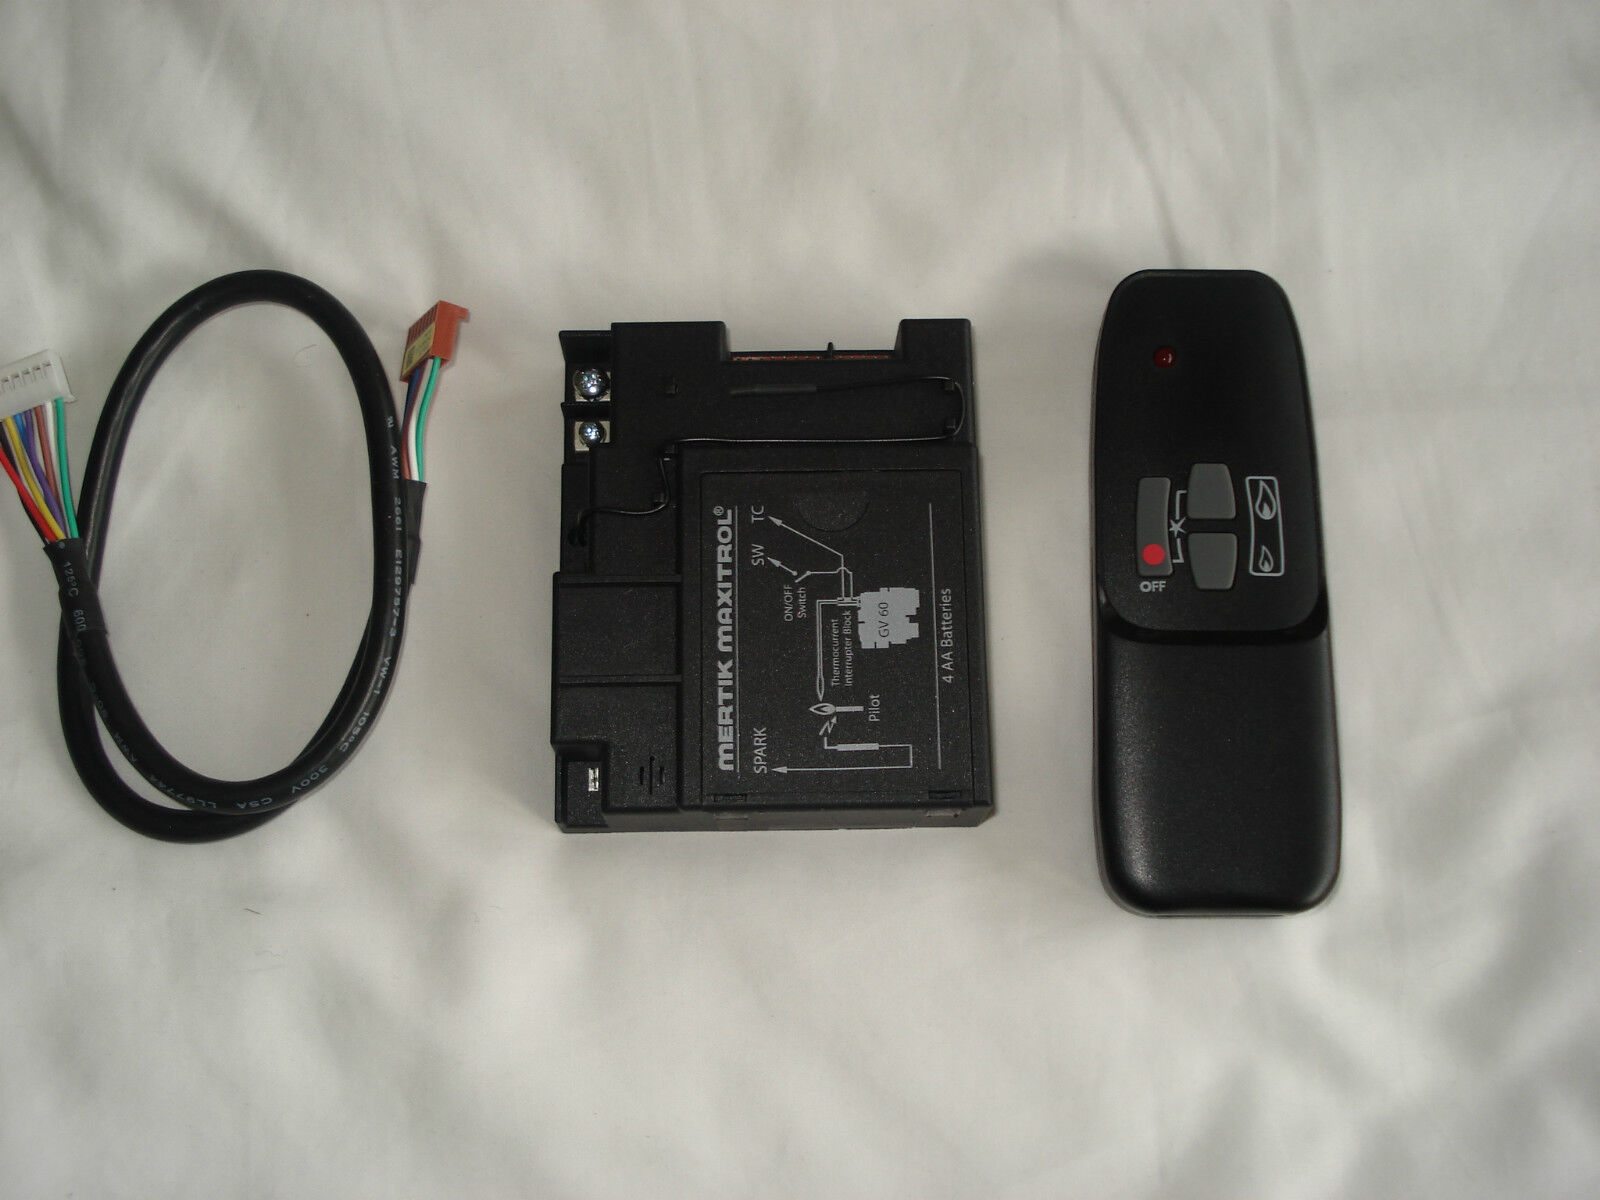 mertik maxitrol remote control reciever g6r r4am handset g6r h4s r